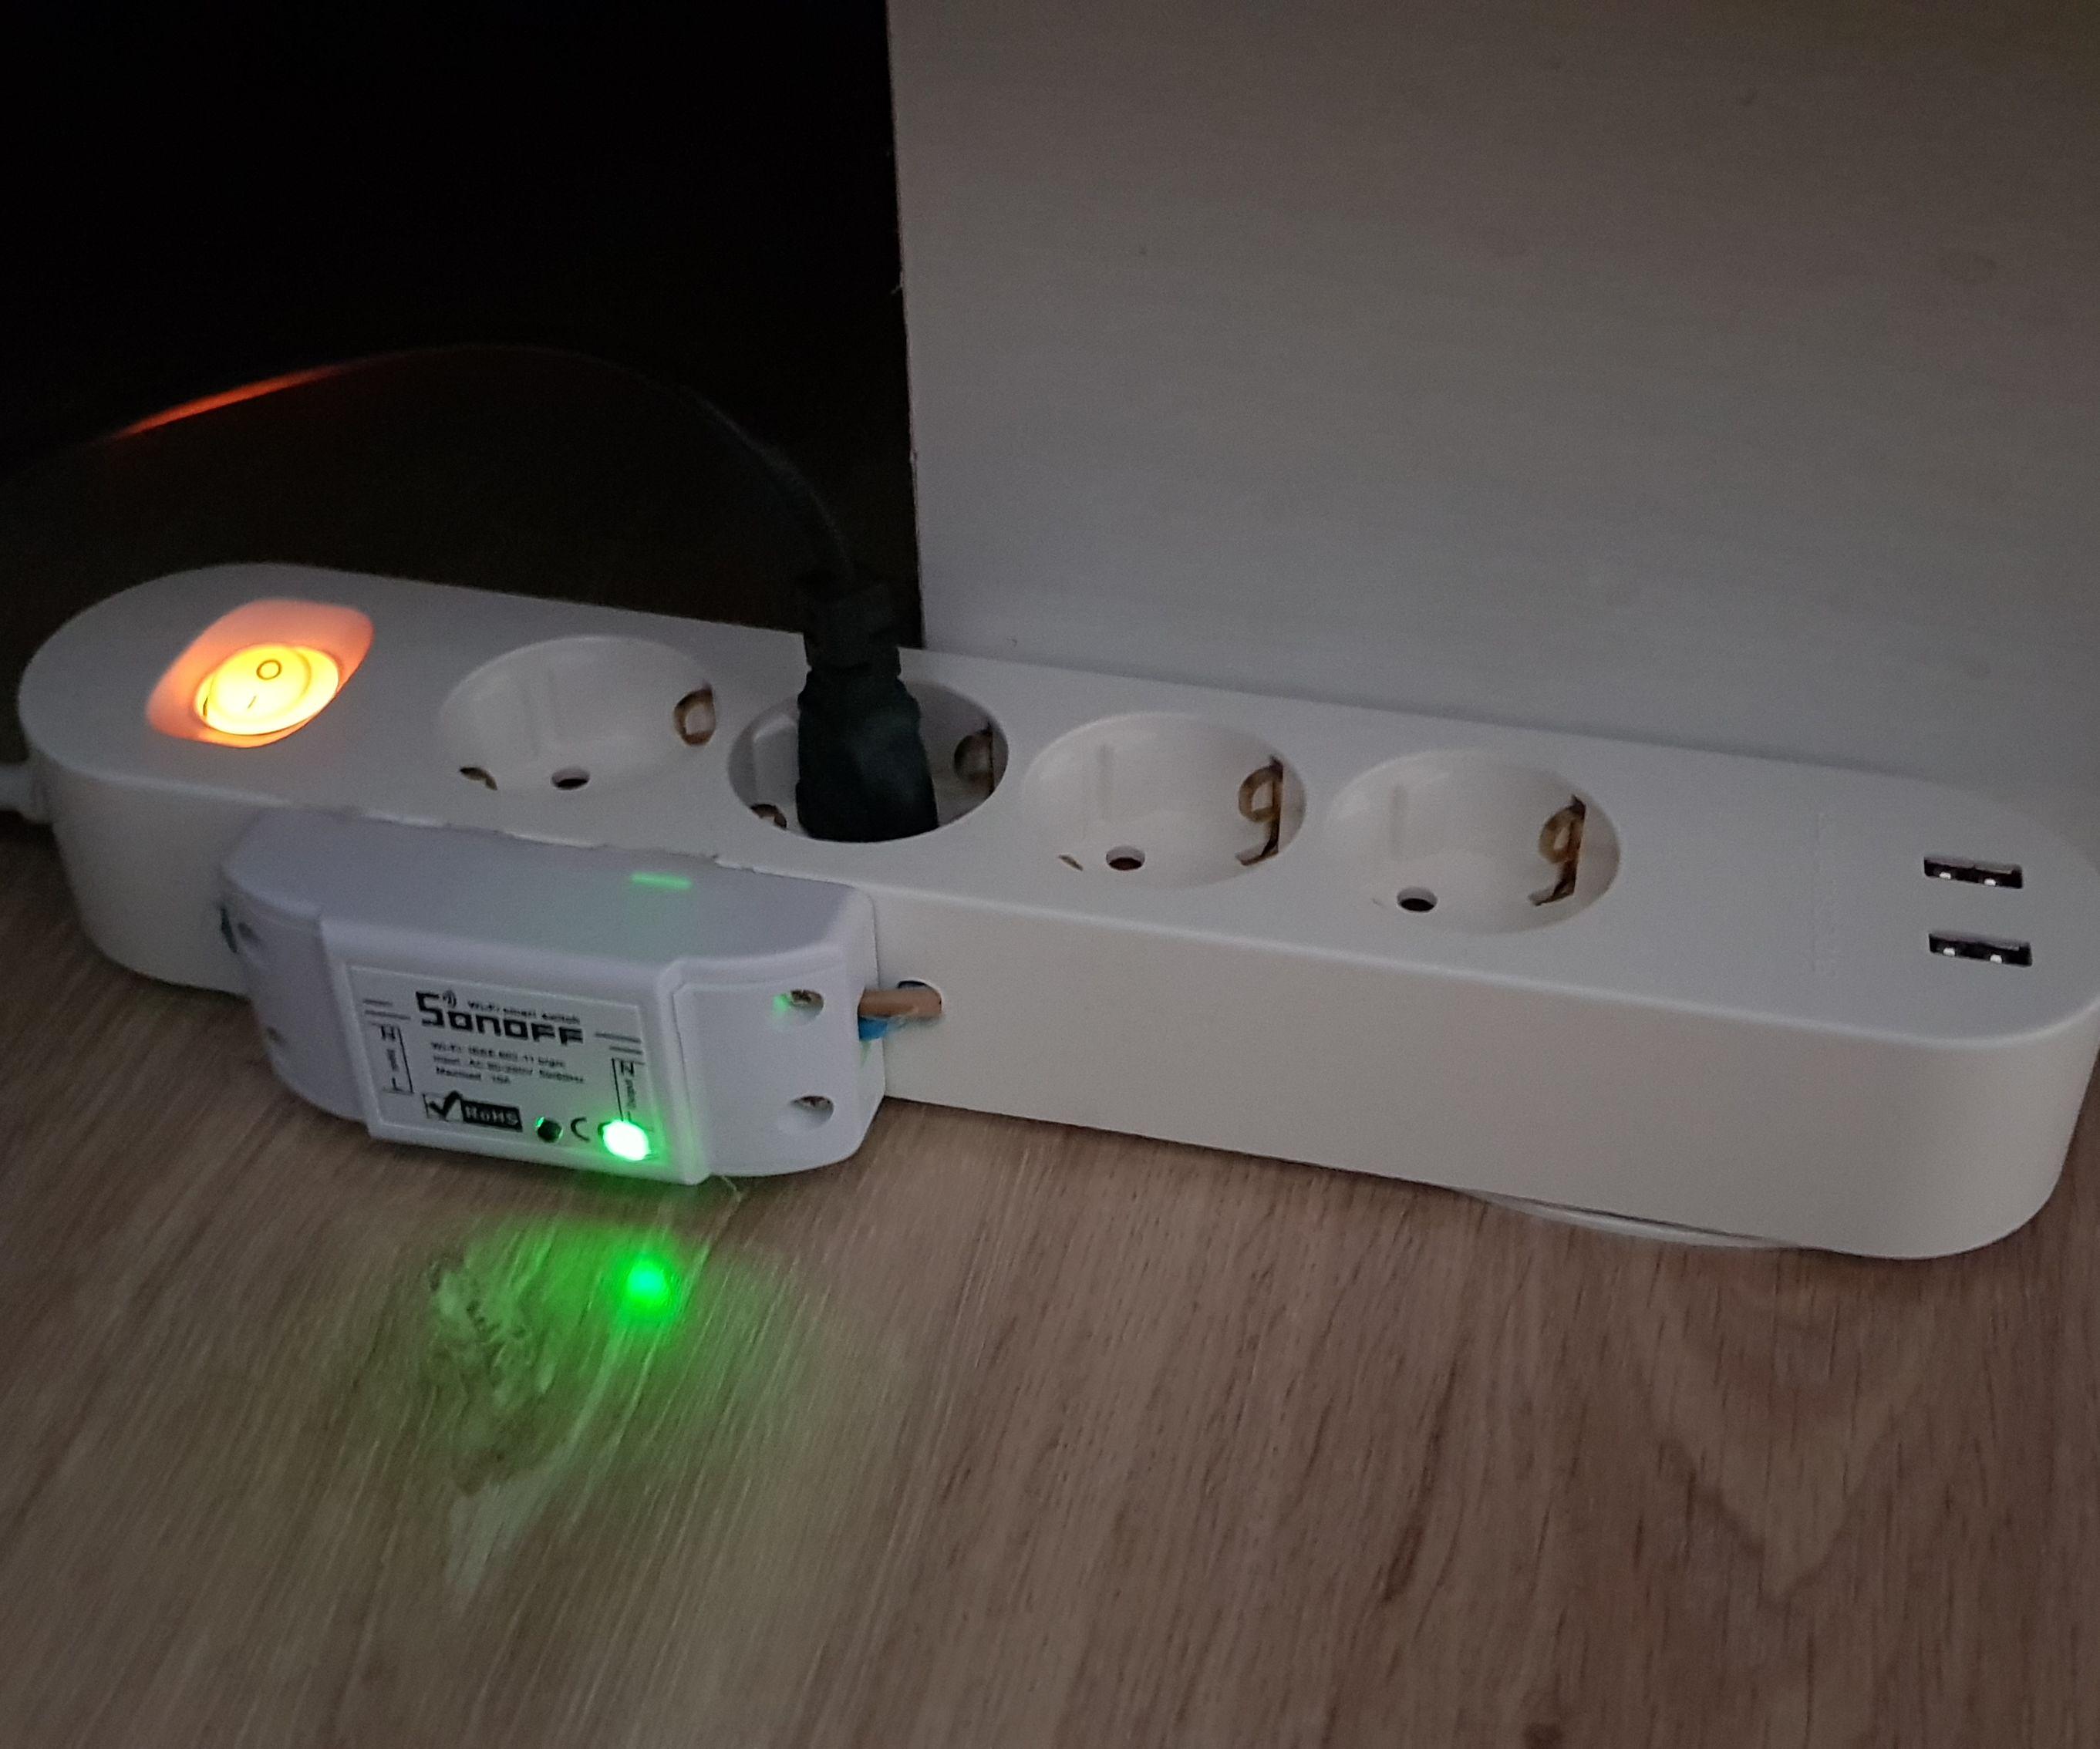 IKEA Wireless Switch - DIY Smart Home